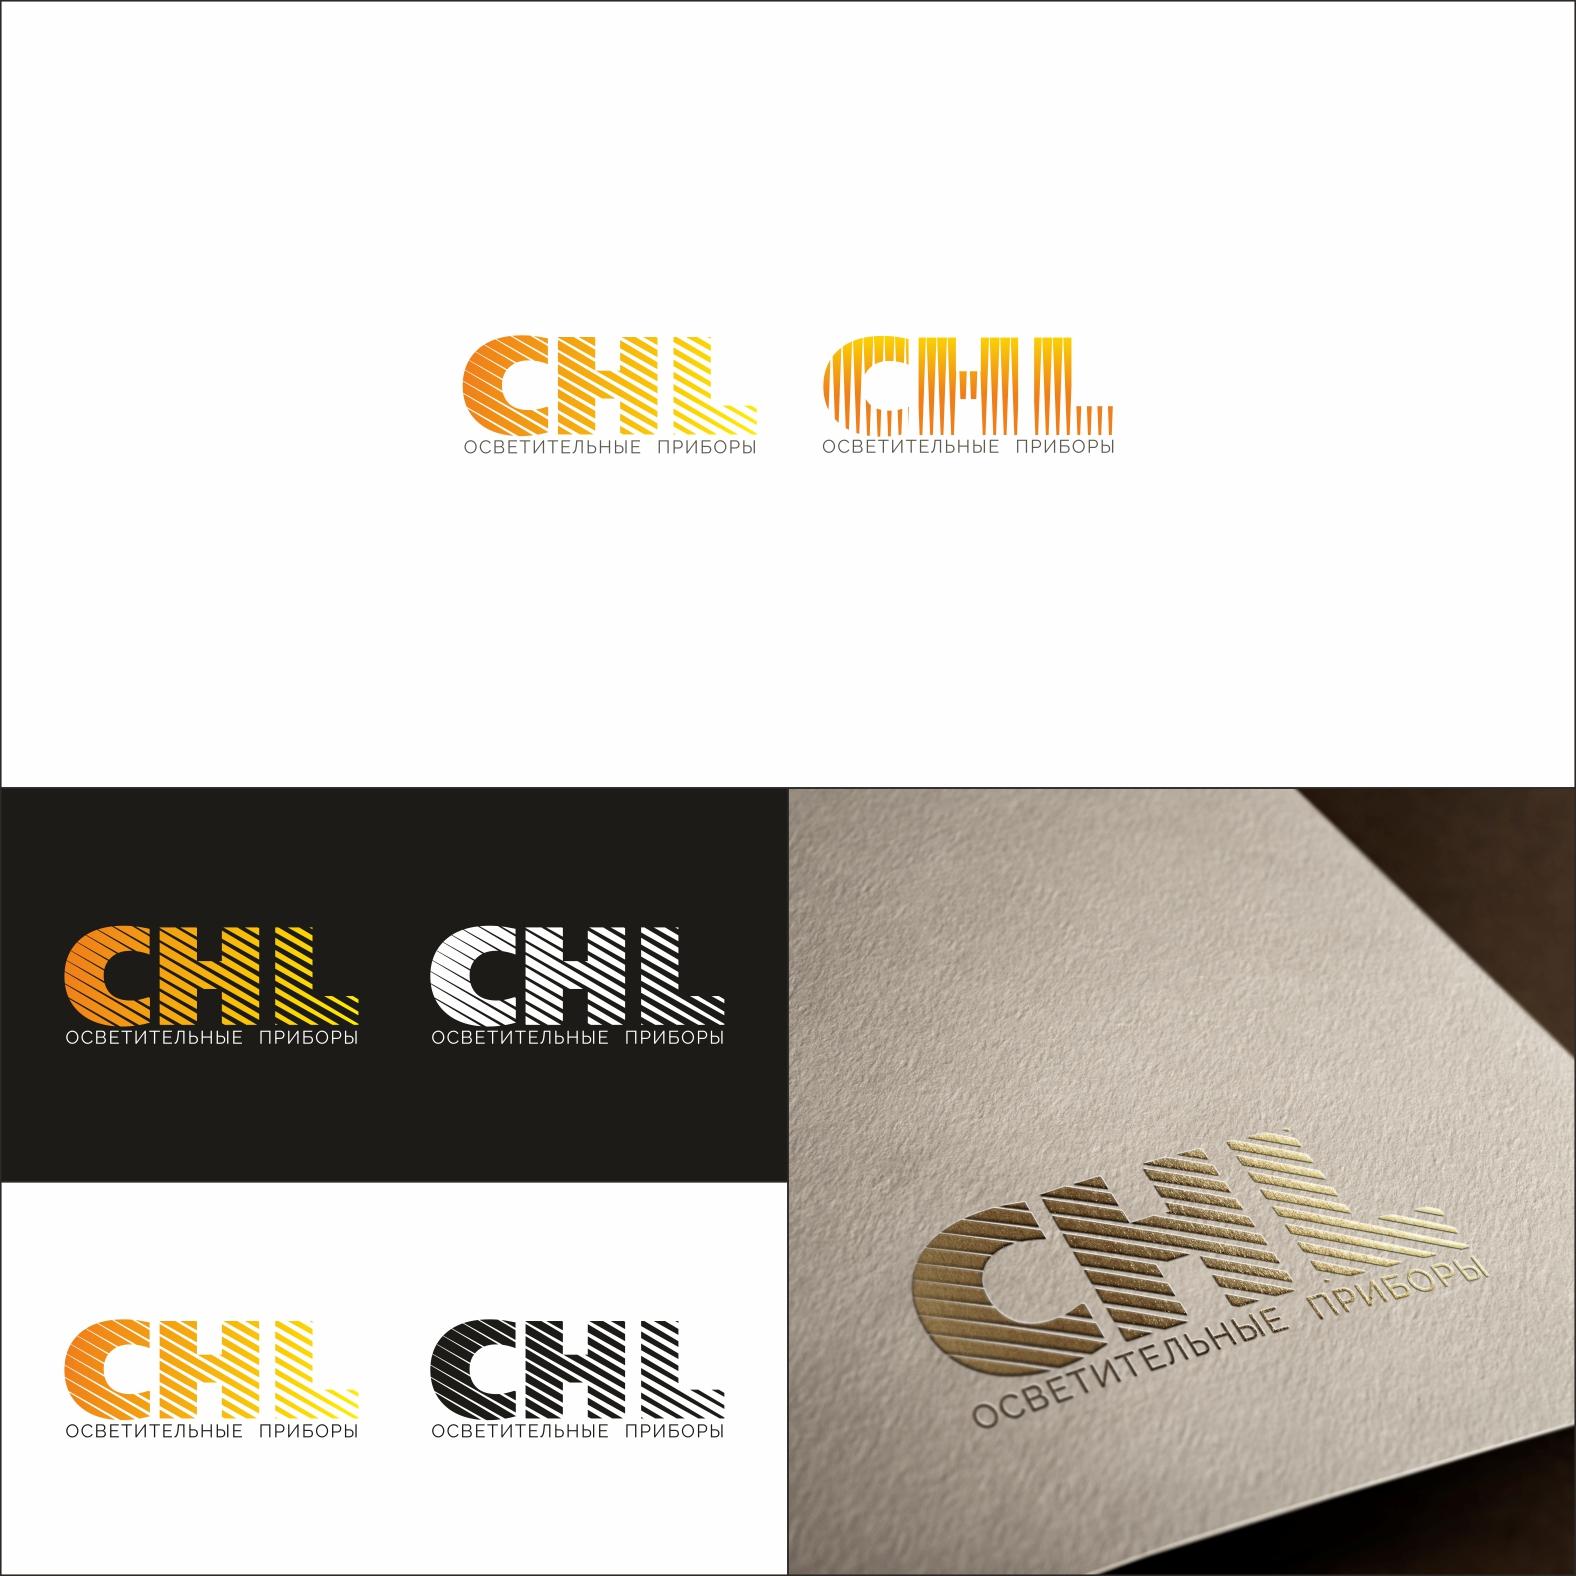 разработка логотипа для производителя фар фото f_9295f5b442e1f49f.jpg